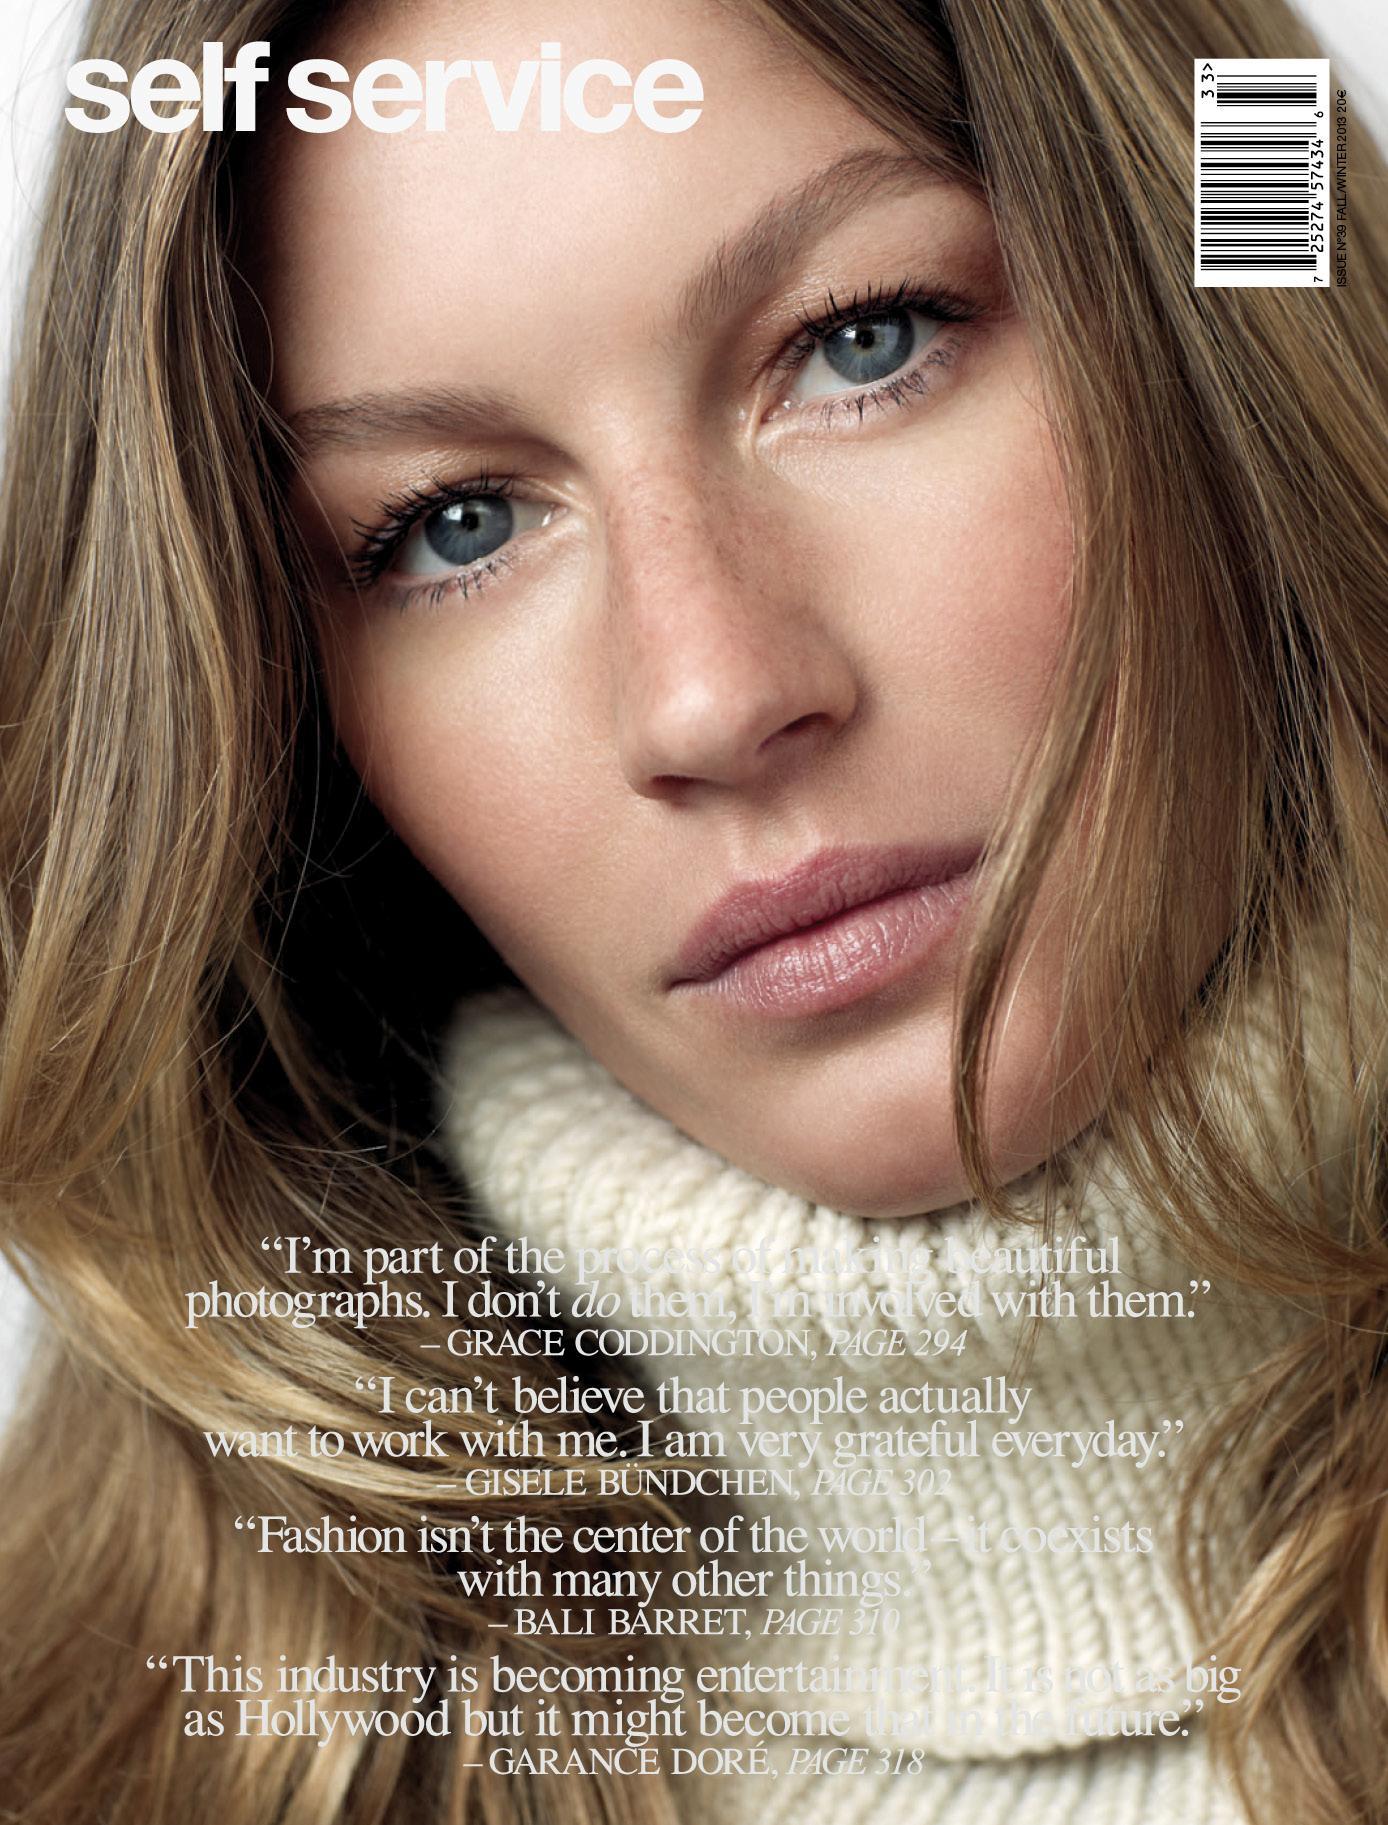 gisele-bc3bcndchen-by-roe-ethridge-for-self-service-magazine-fw-2013-2014